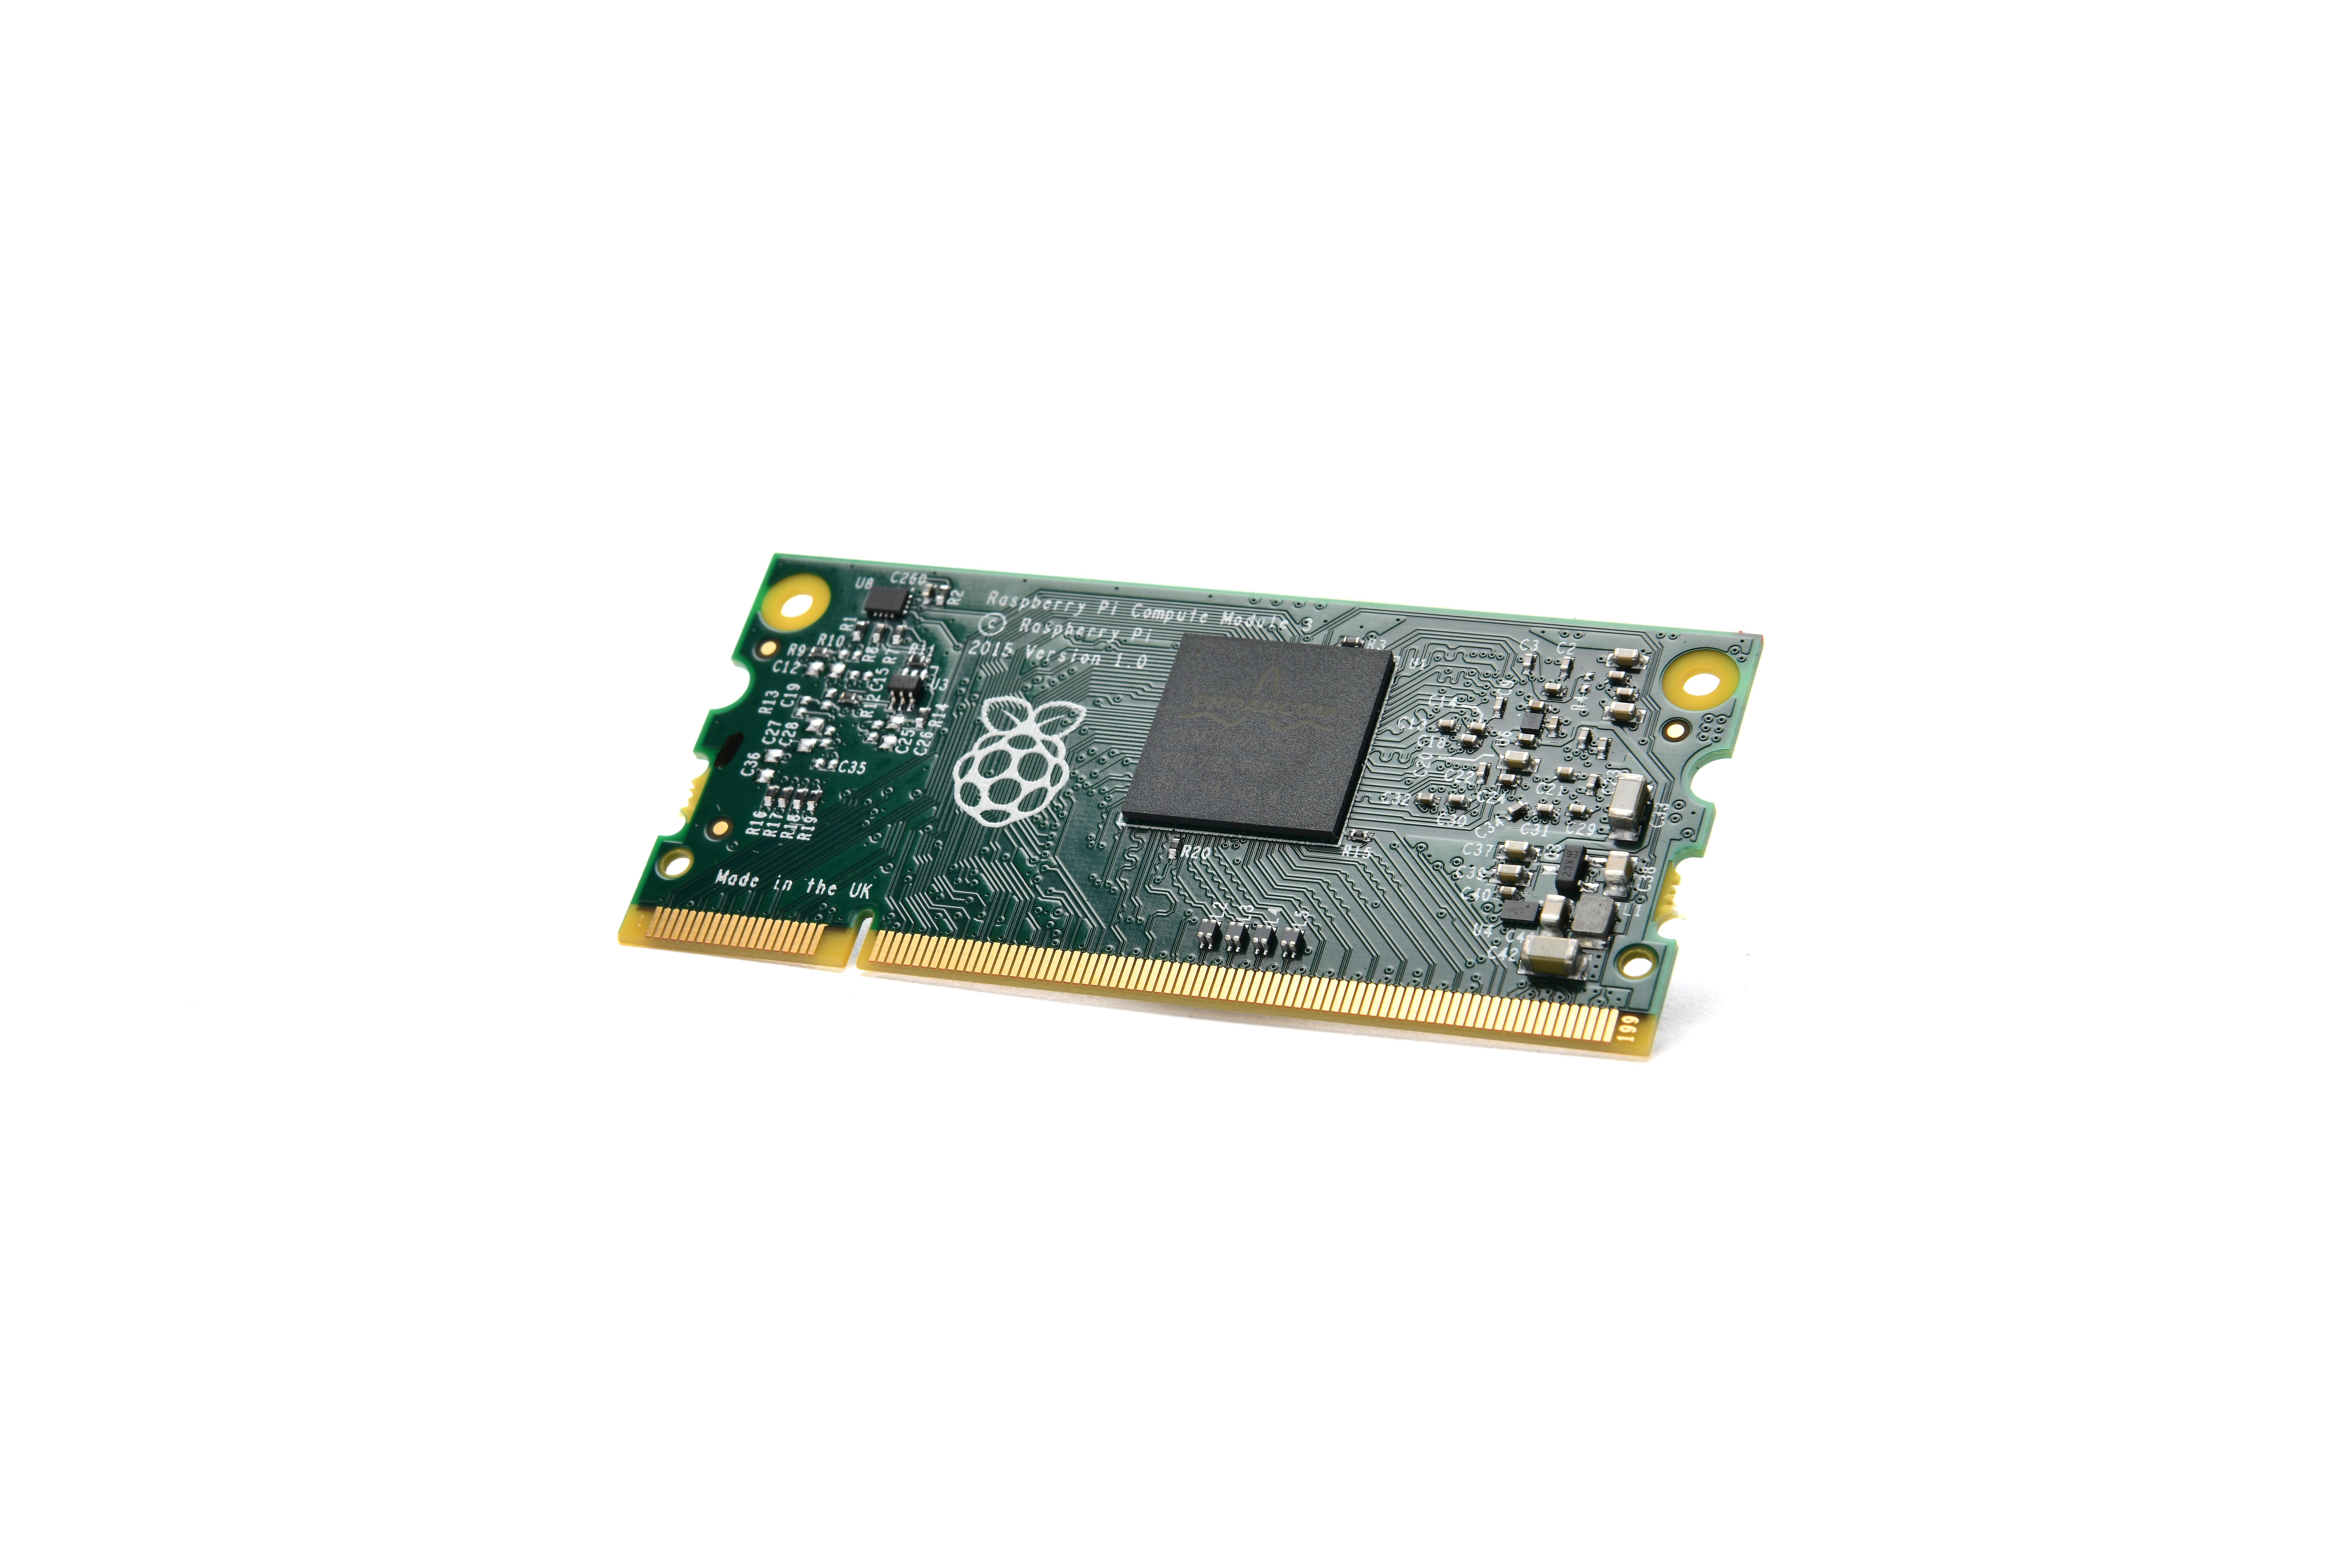 RaspberryPi Compute Module 3 Lite